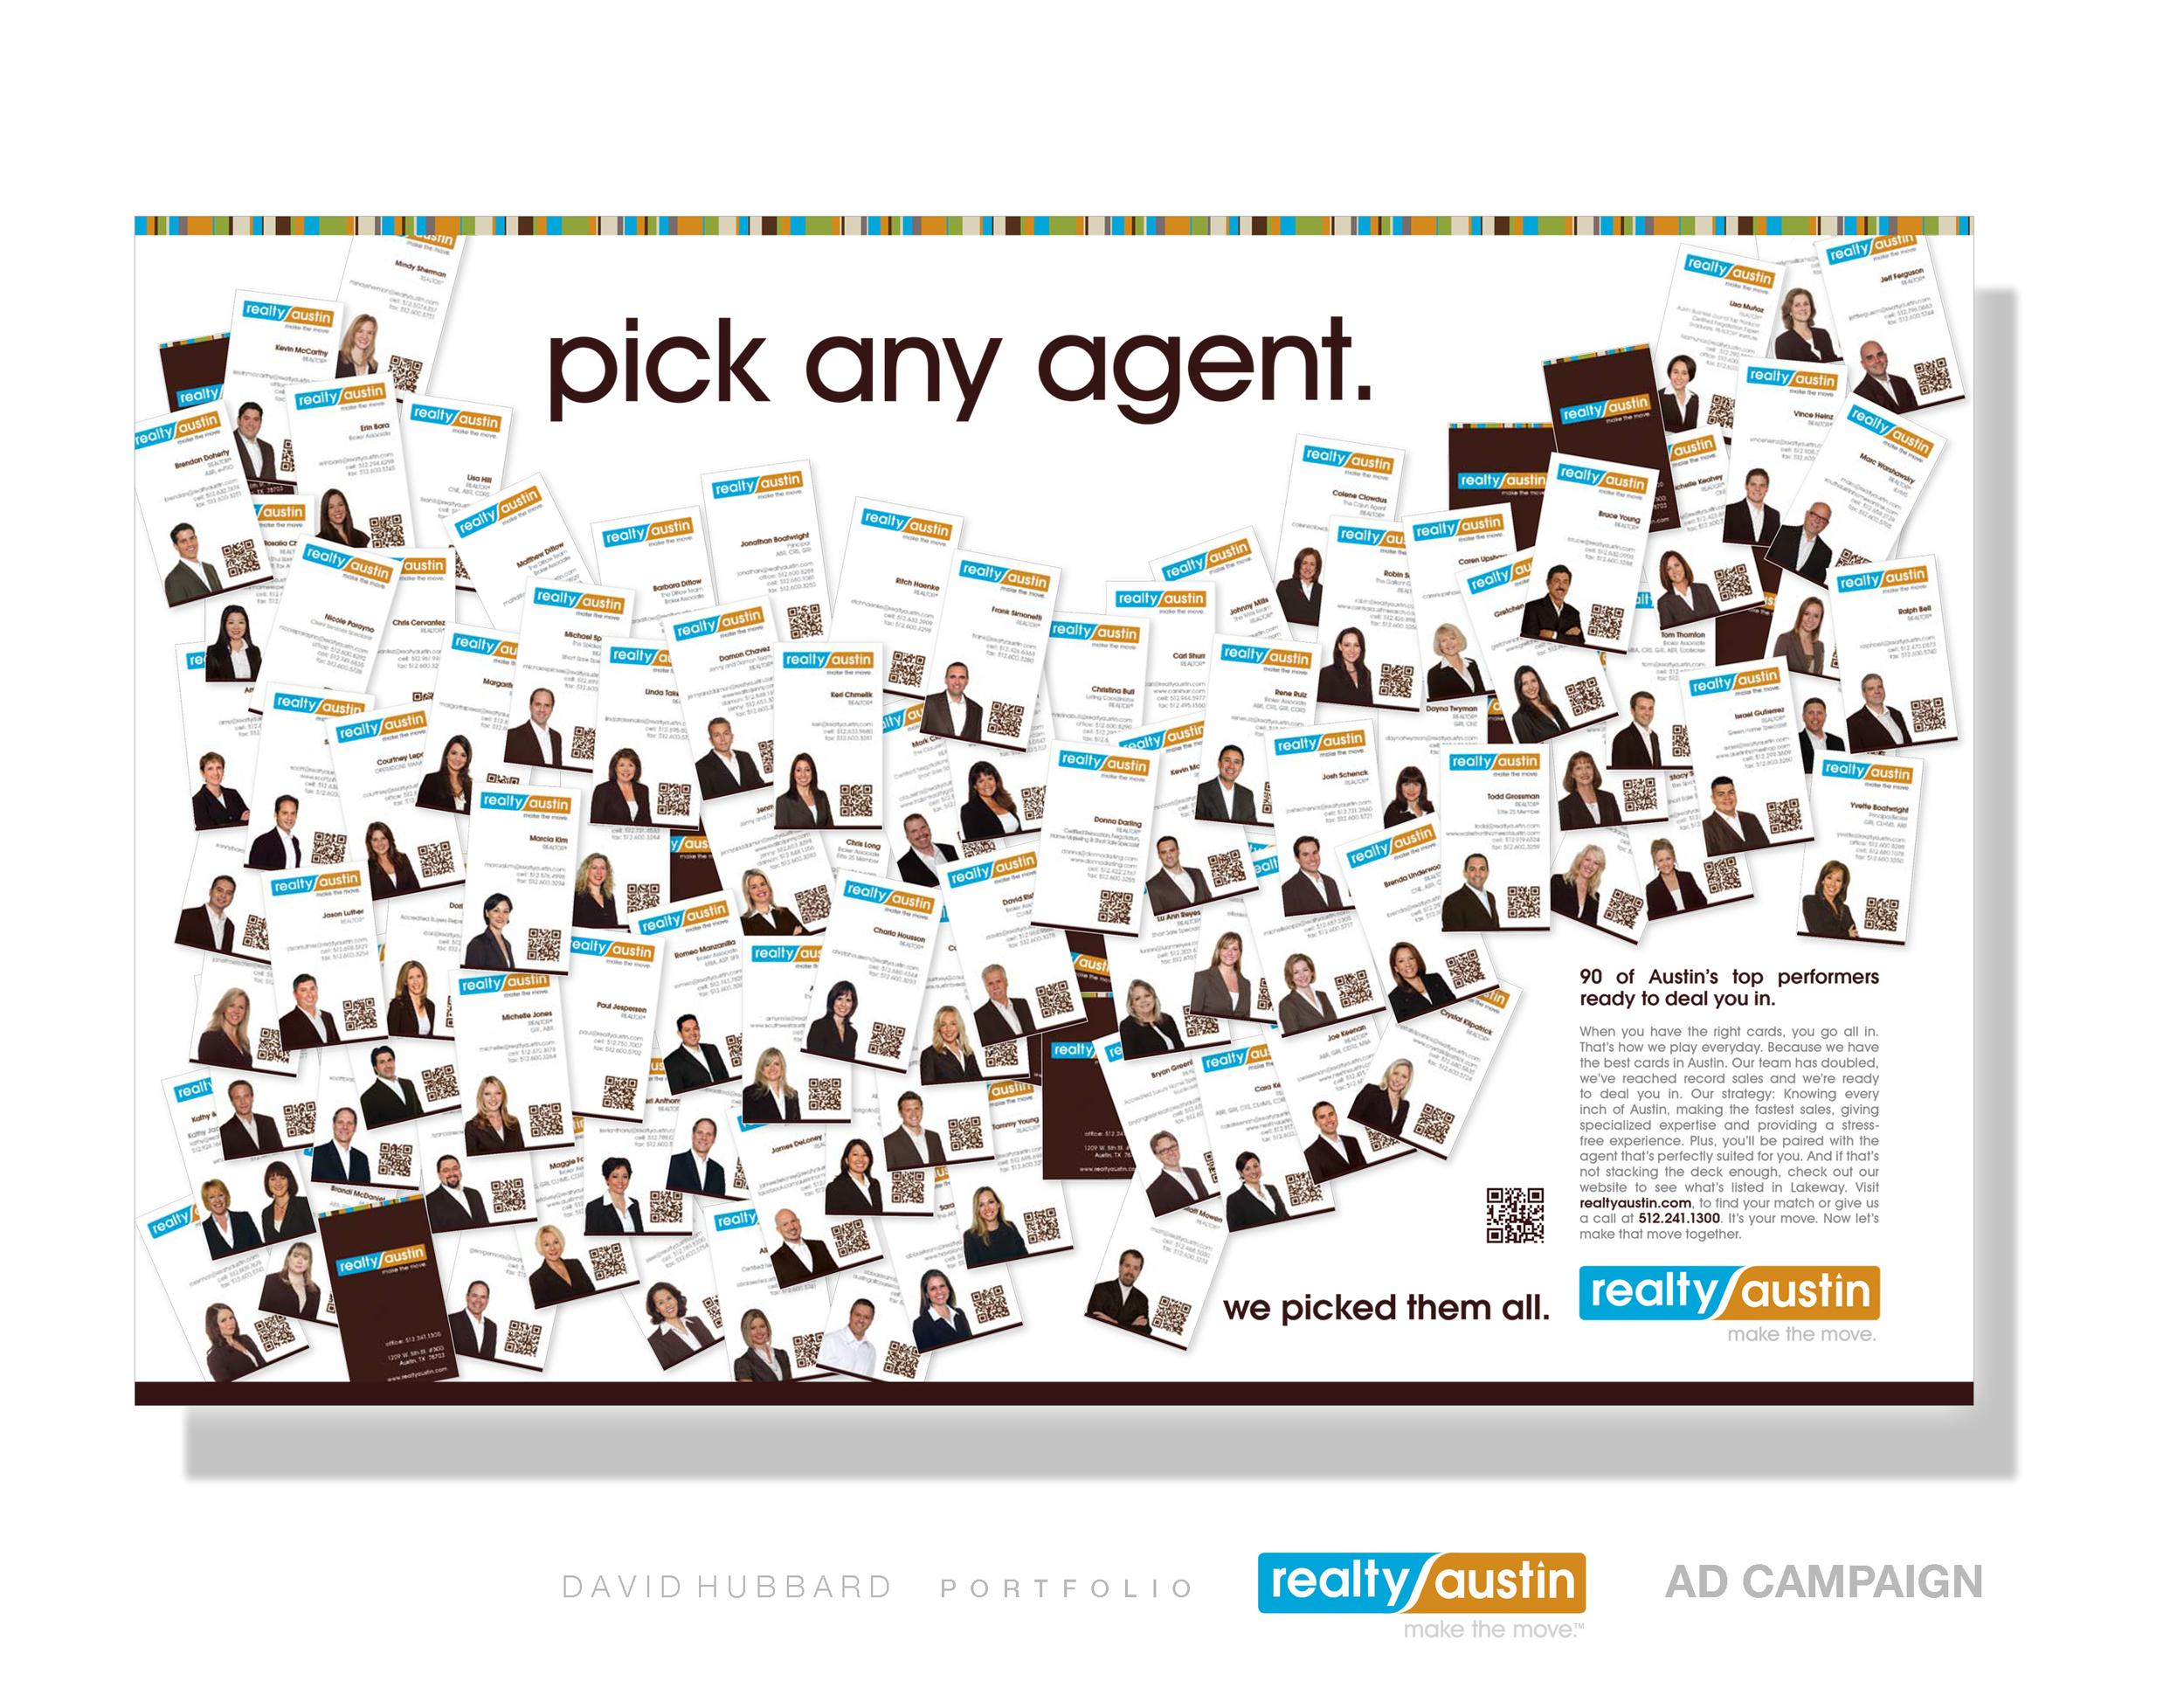 Davids Portfolio Book Page 7 Pick Any Agent.jpg